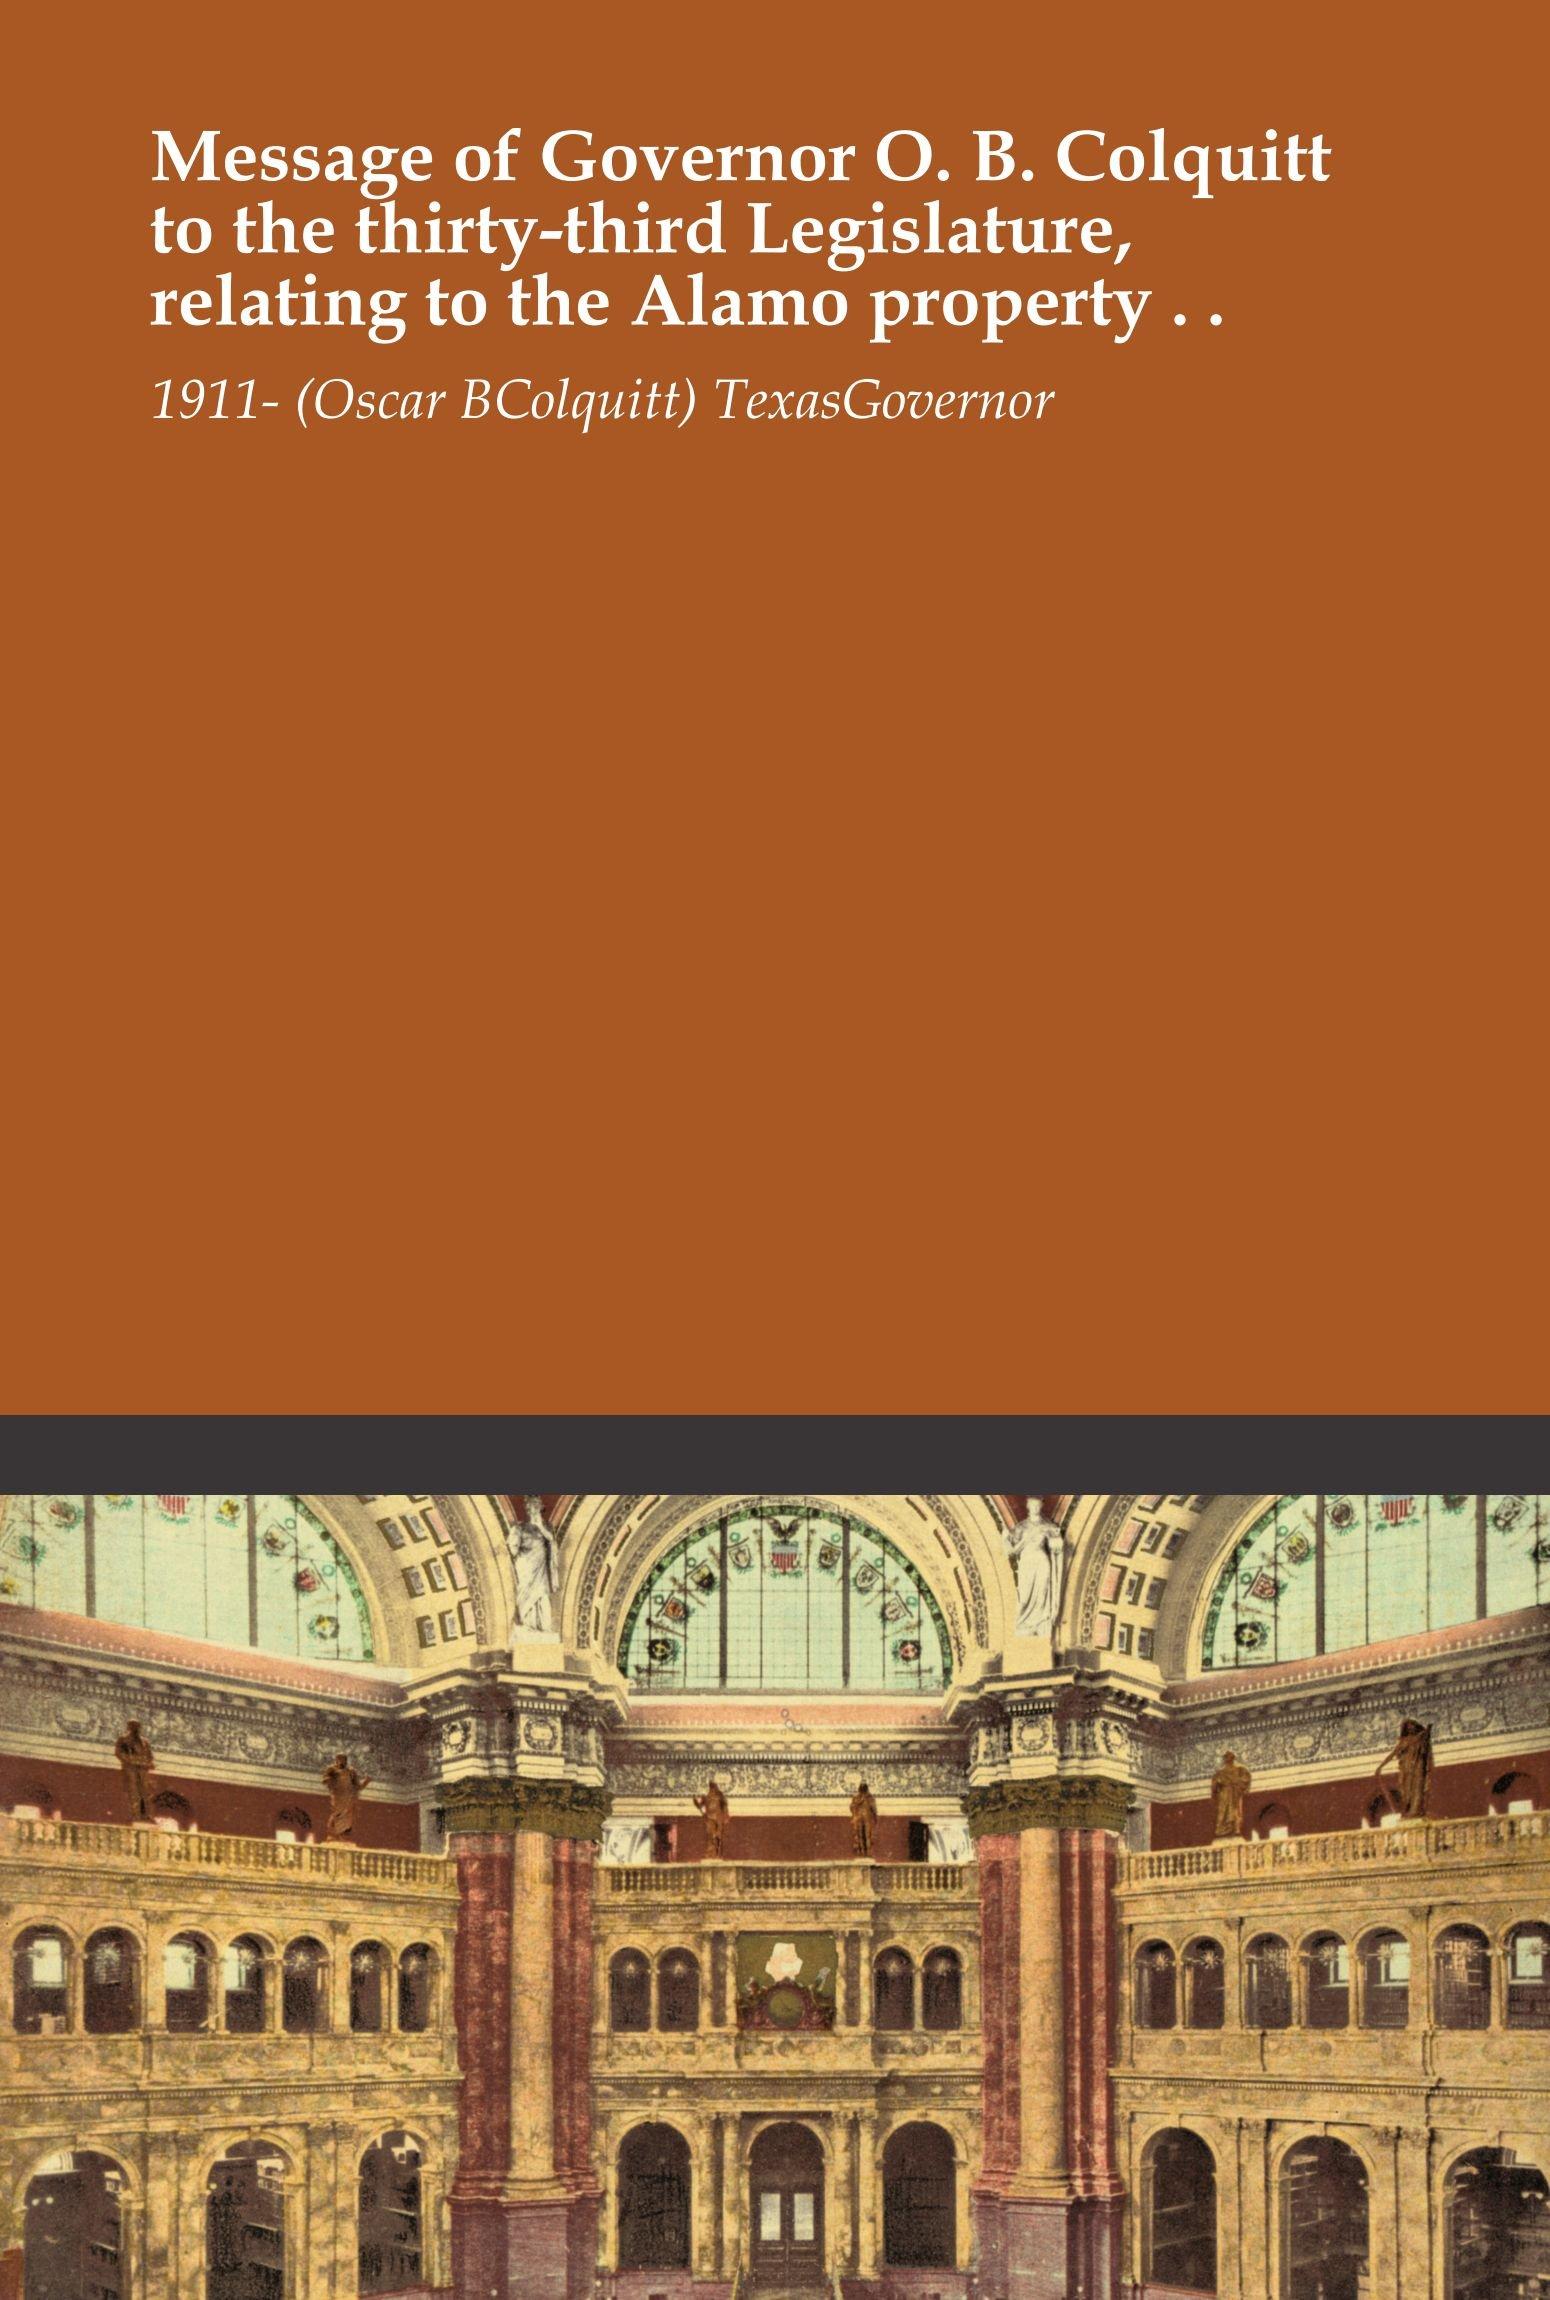 Message of Governor O. B. Colquitt to the thirty-third Legislature, relating to the Alamo property . . ebook